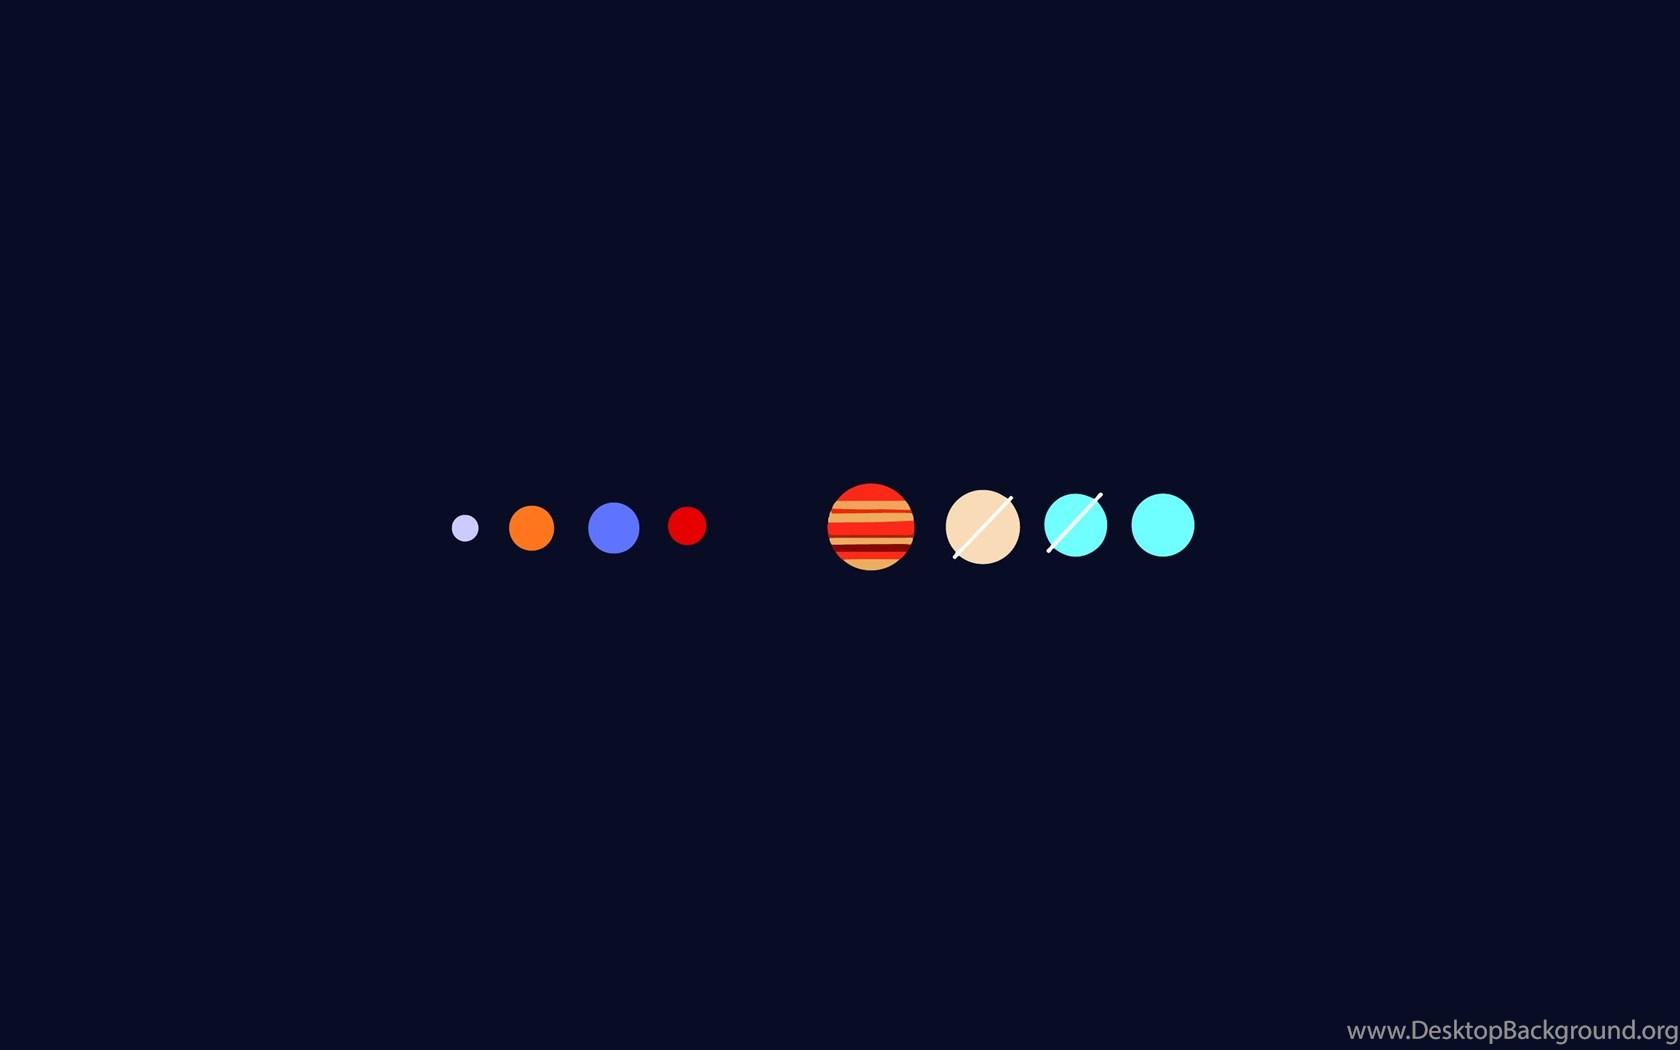 HD Minimalist Simple Minimal Planets Wallpapers Full HD ...